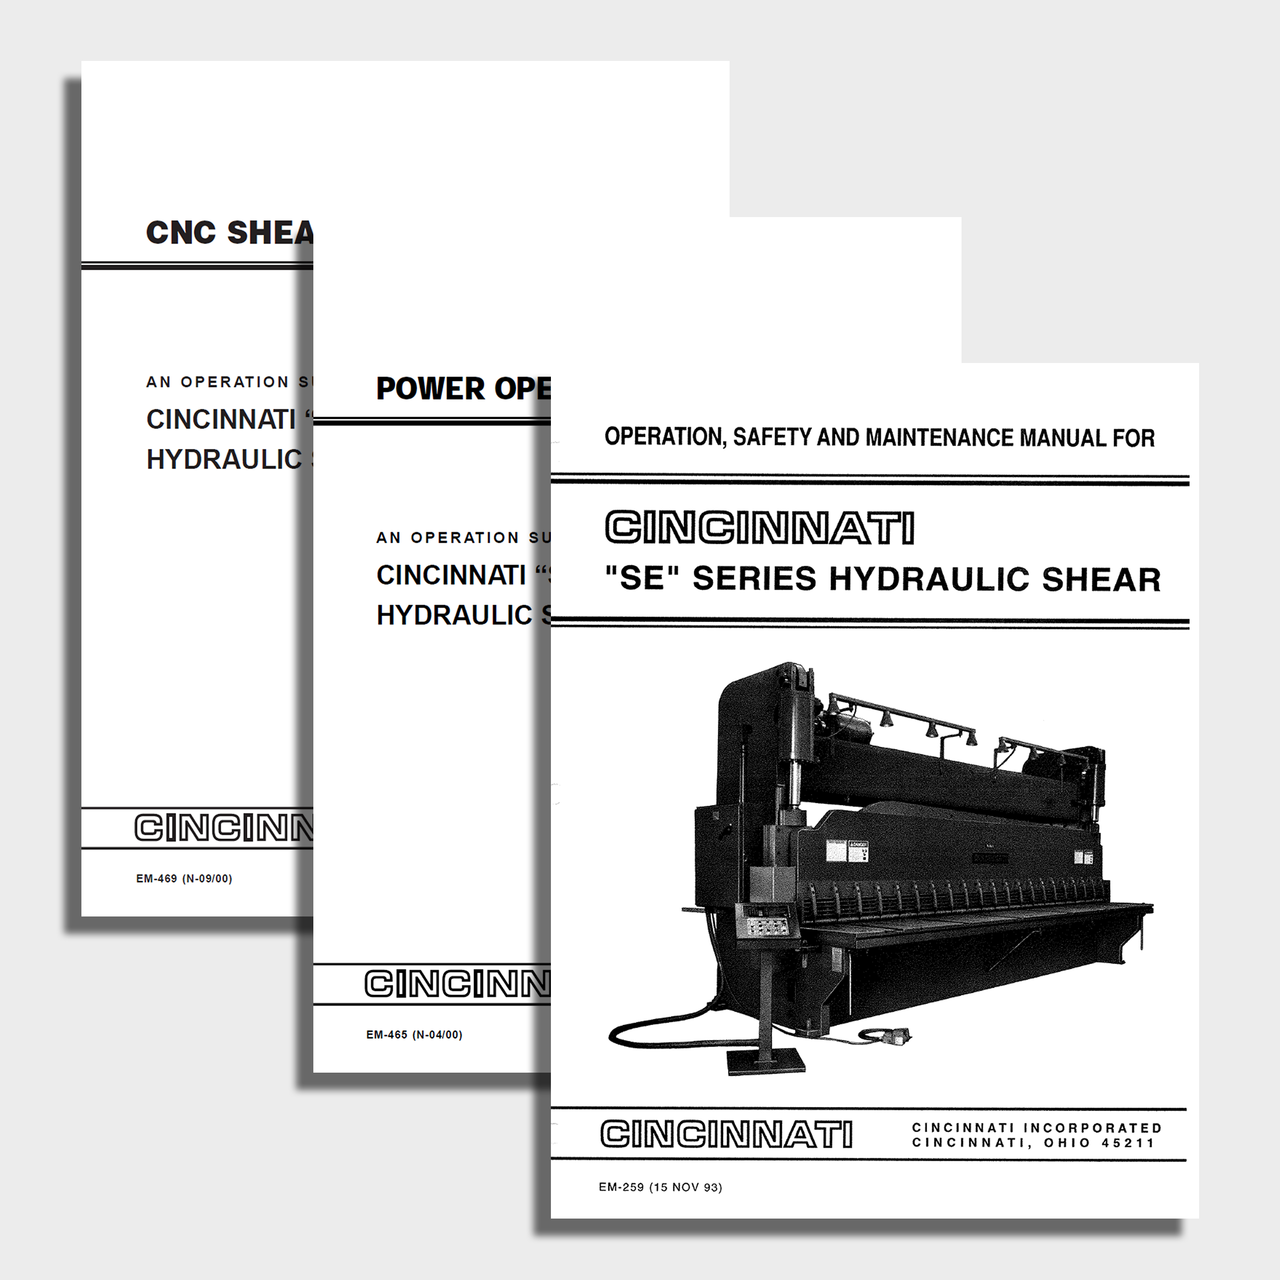 SE Series Hydraulic CNC Shear Manual Bundle